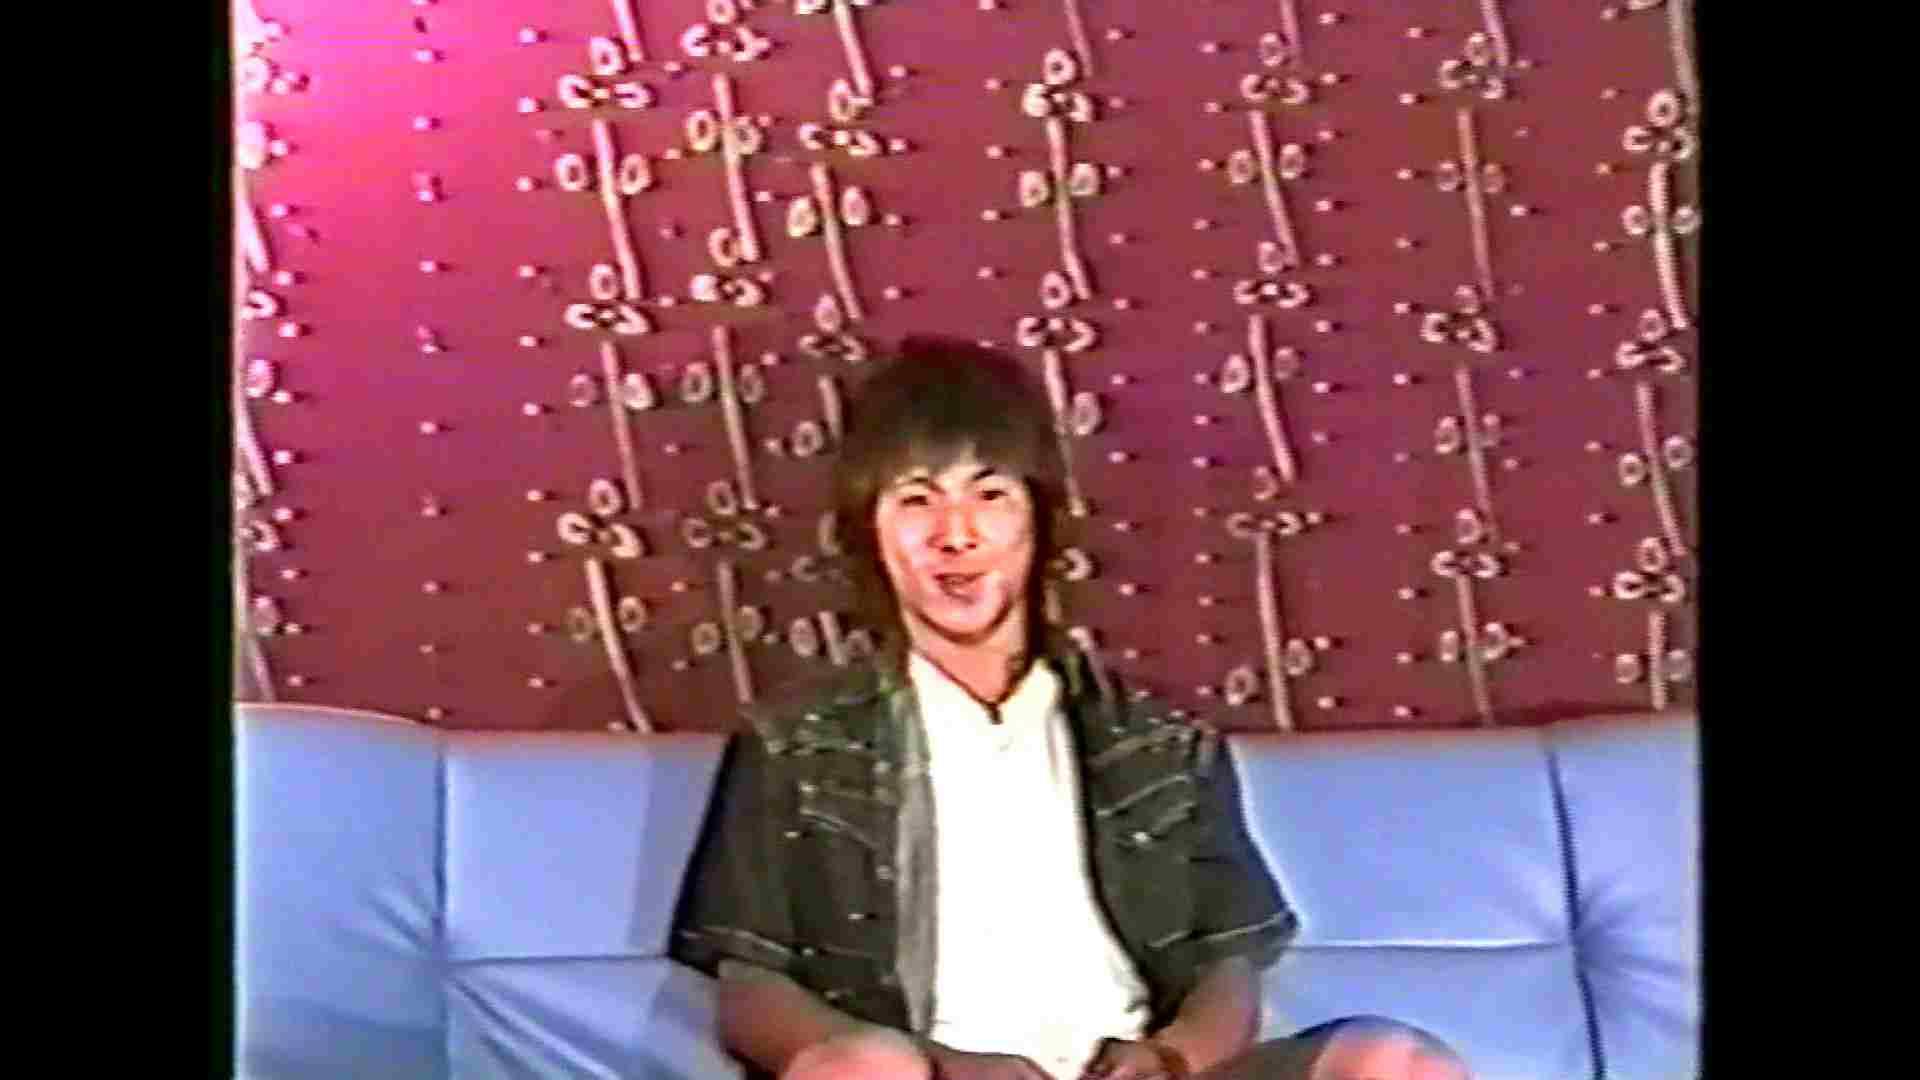 GAYBOY宏のオカズ倉庫Vol.3-1 無修正 ゲイヌード画像 98pic 14